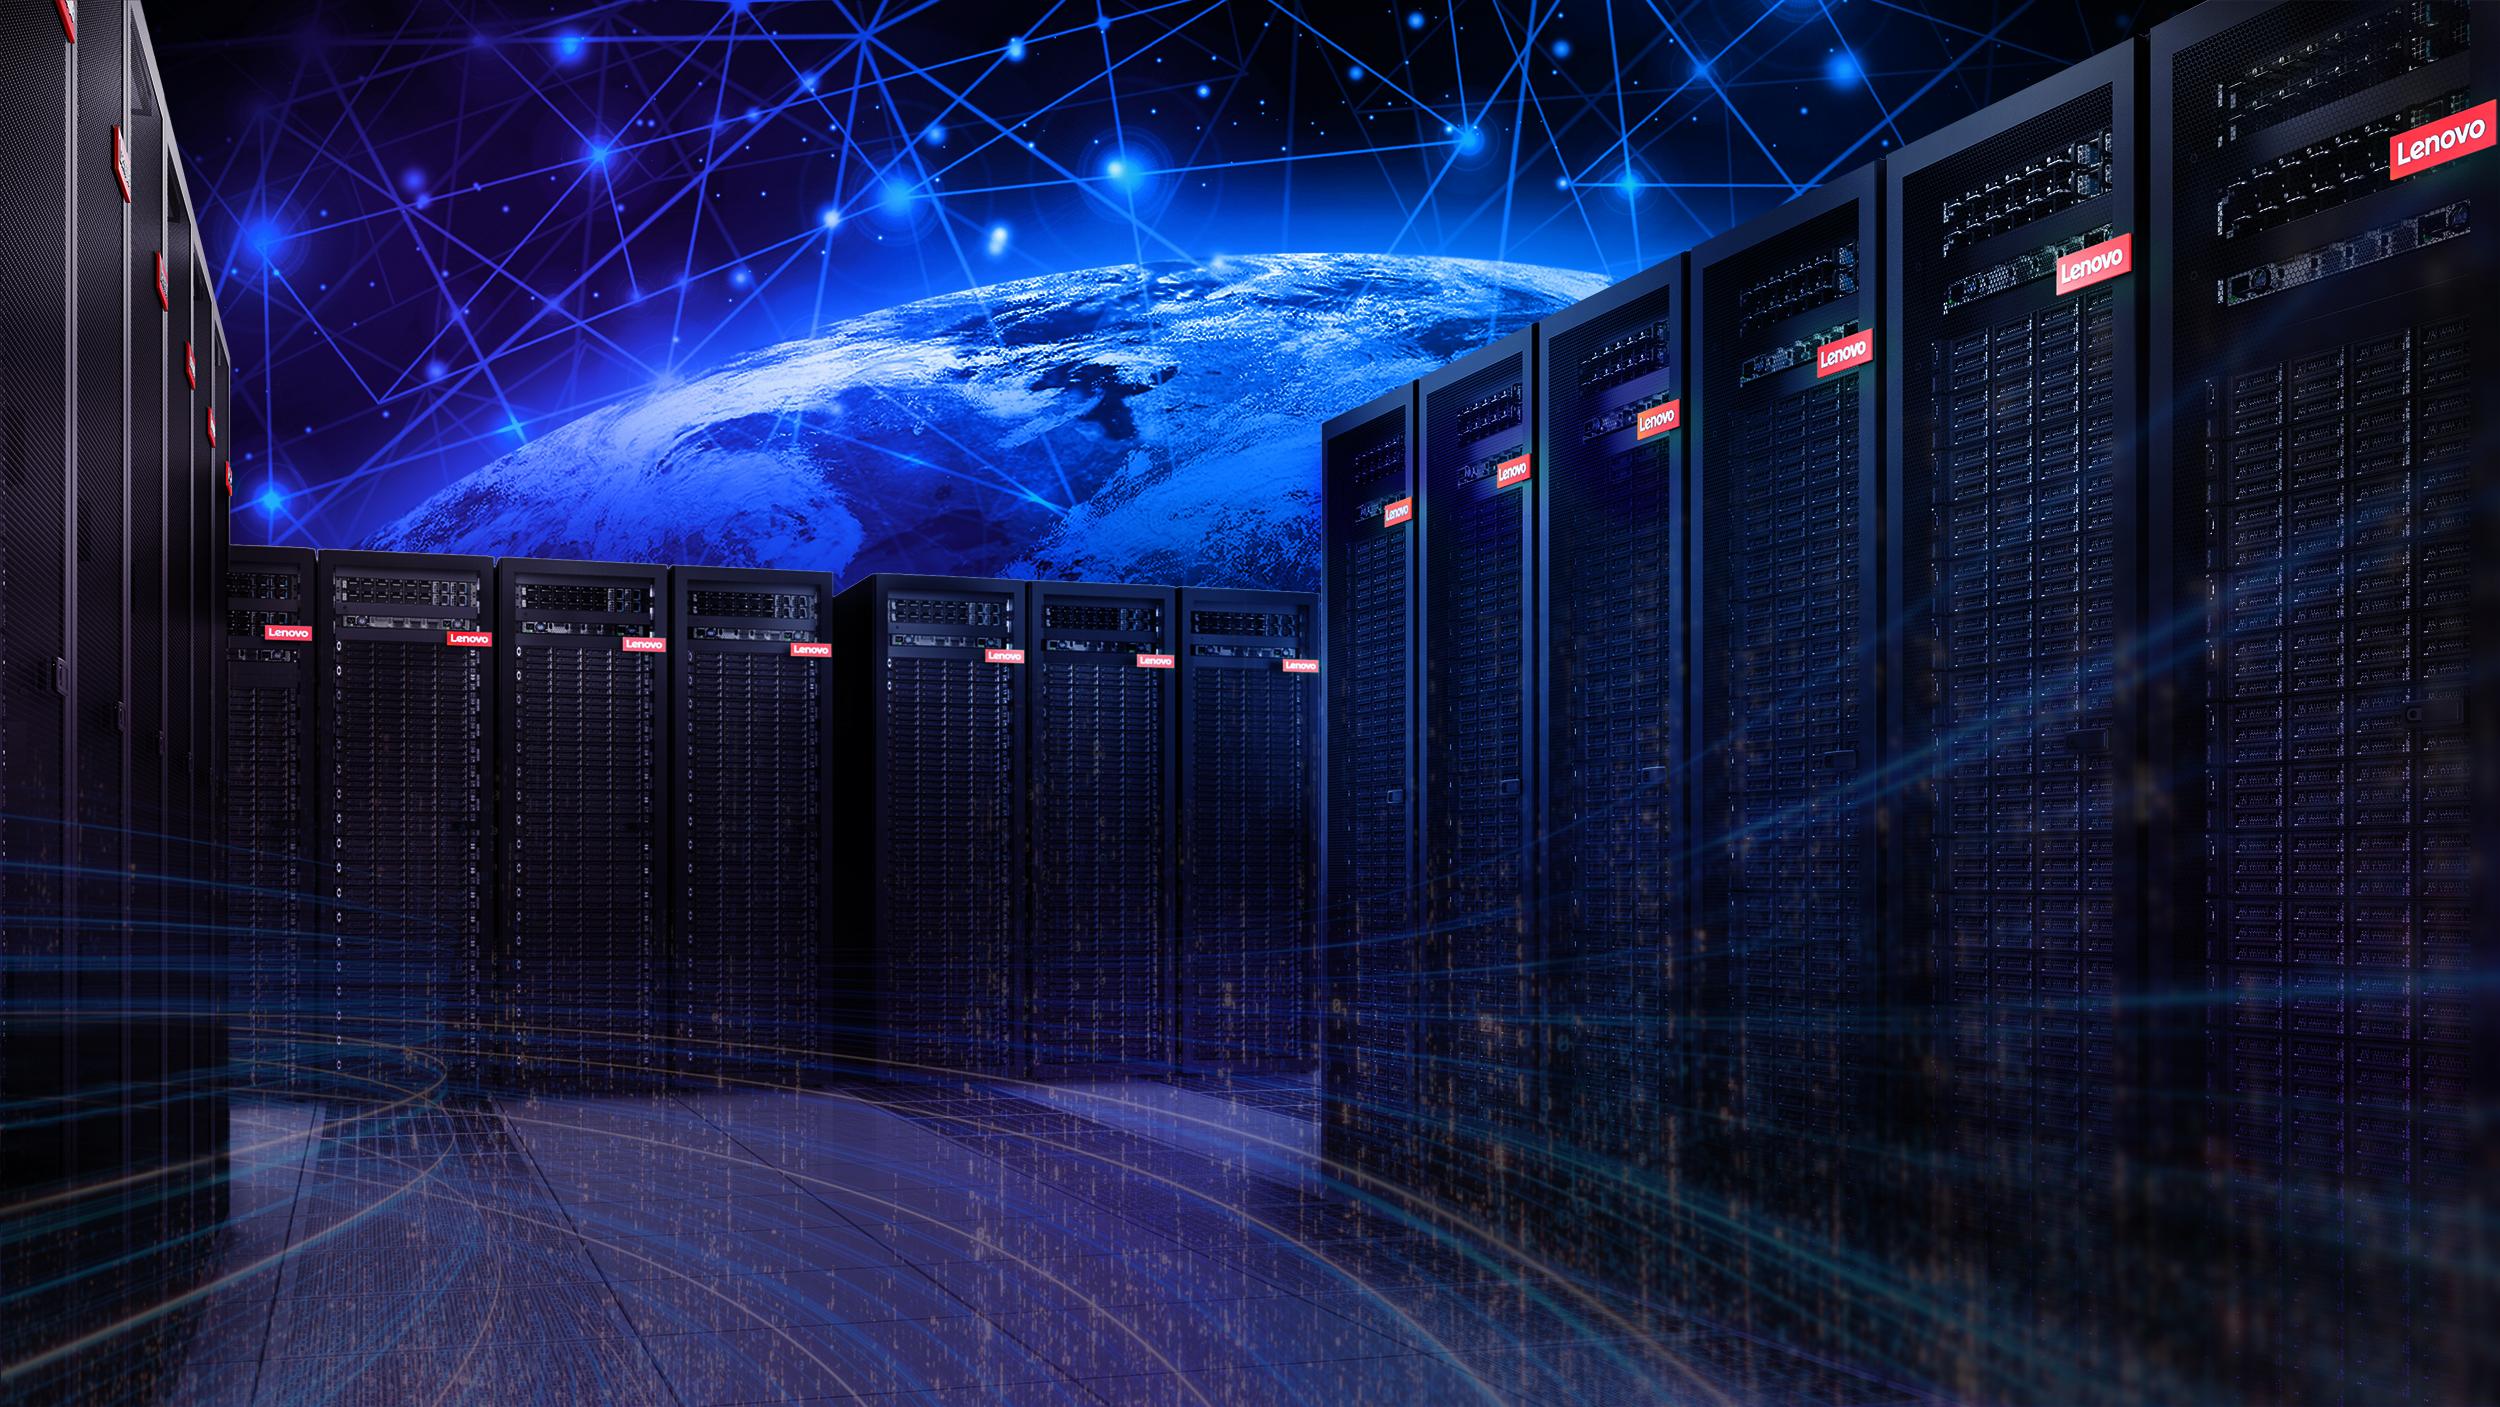 Lenovo crece como sólido proveedor de soluciones de TI